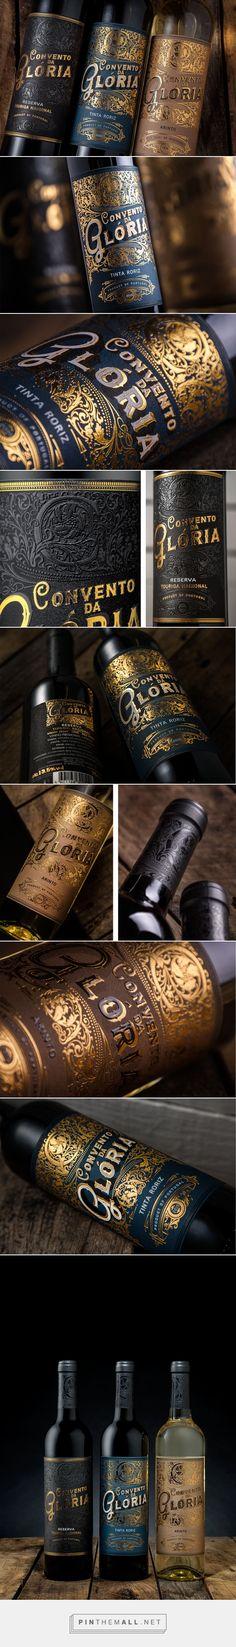 Convento da Gloria Wine Packaging by MA Creative Agency | Fivestar Branding – Design and Branding Agency & Inspiration Gallery